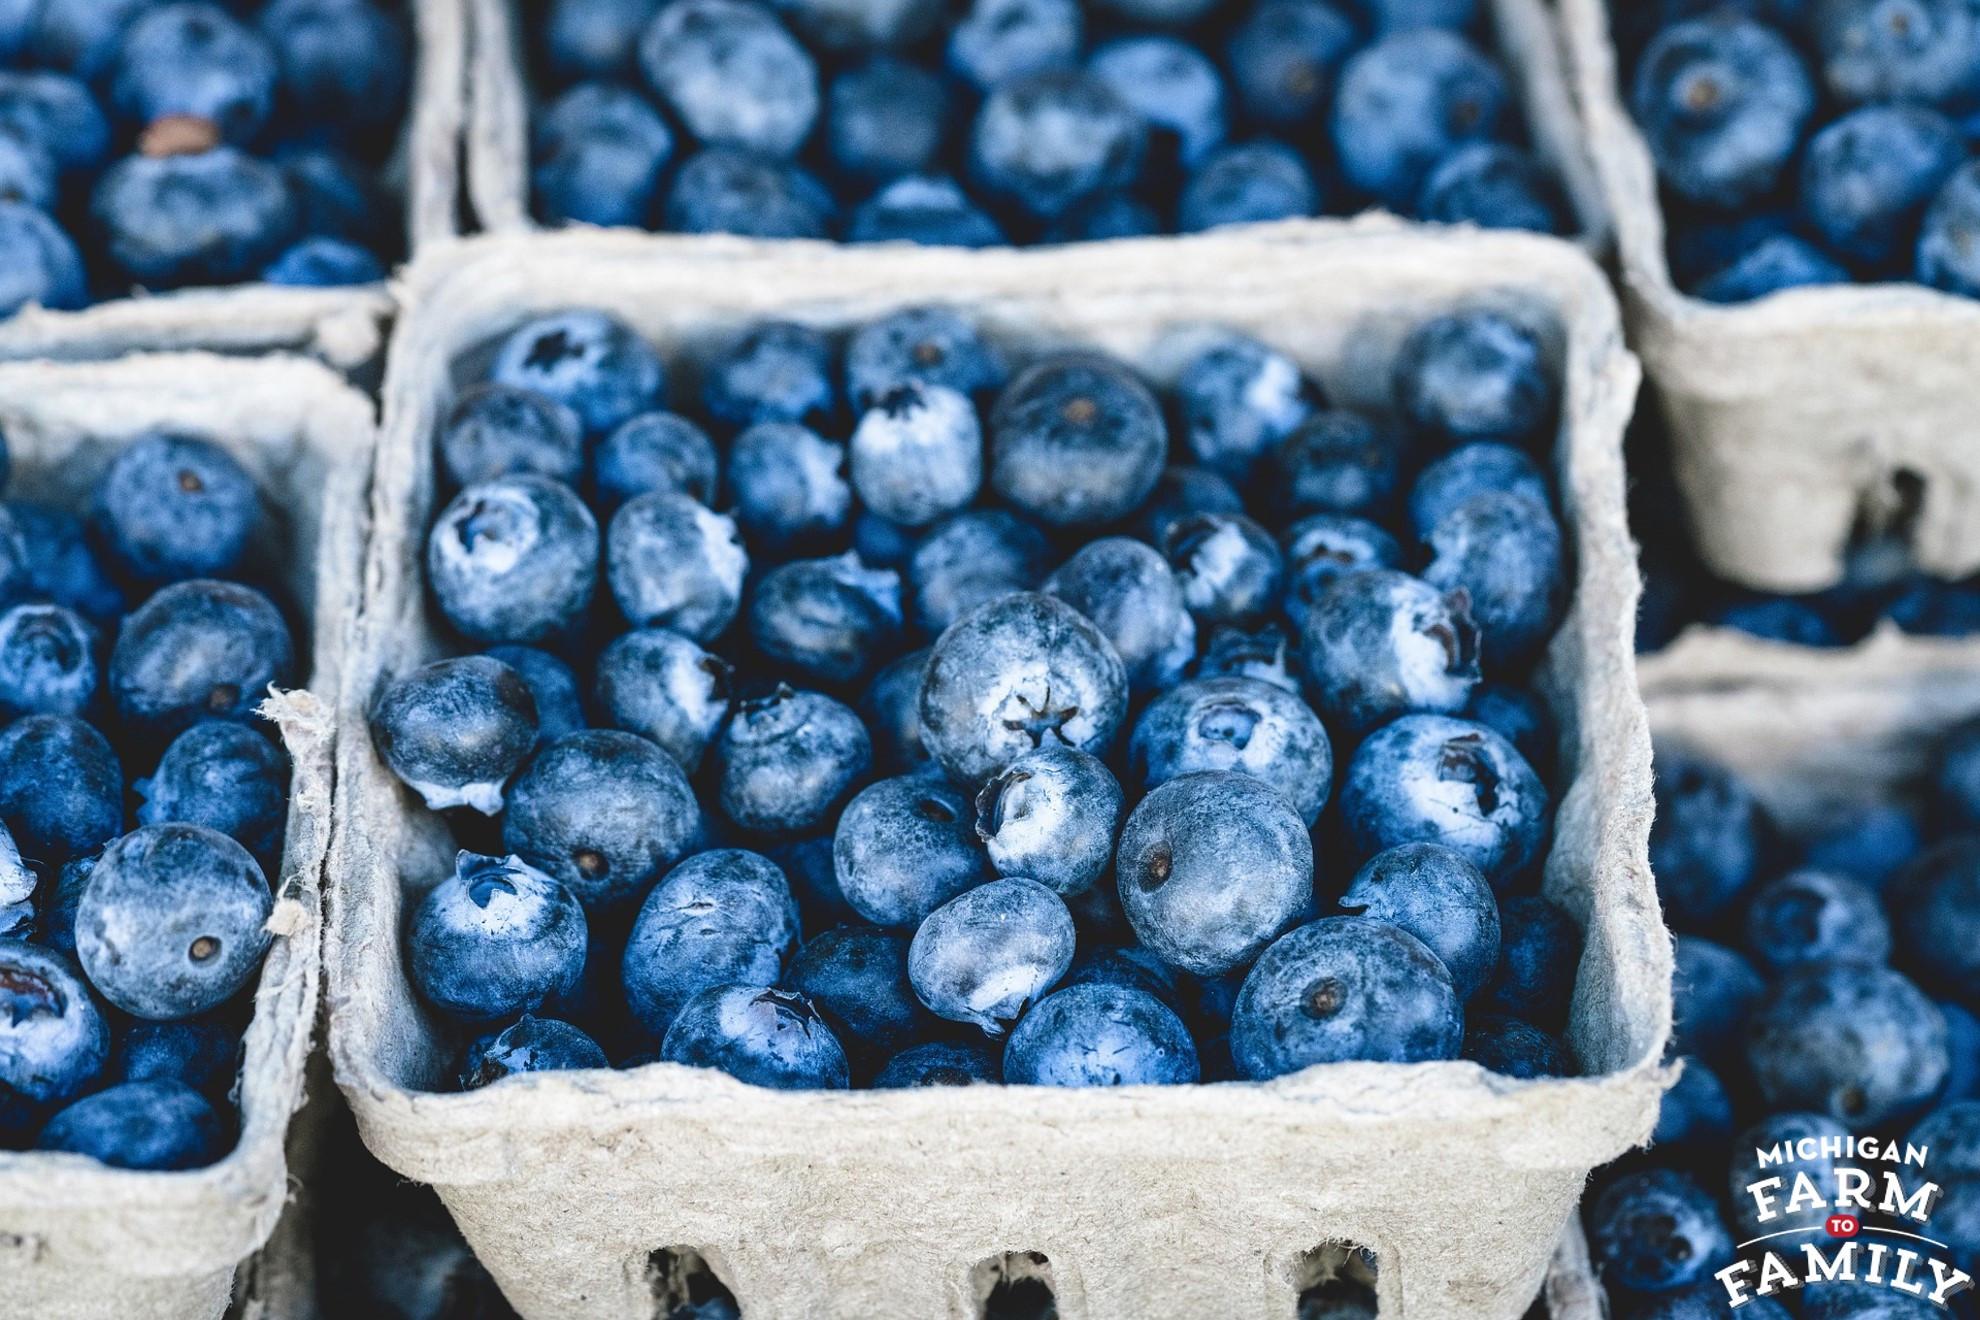 Michigan-Grown Organic Blueberries